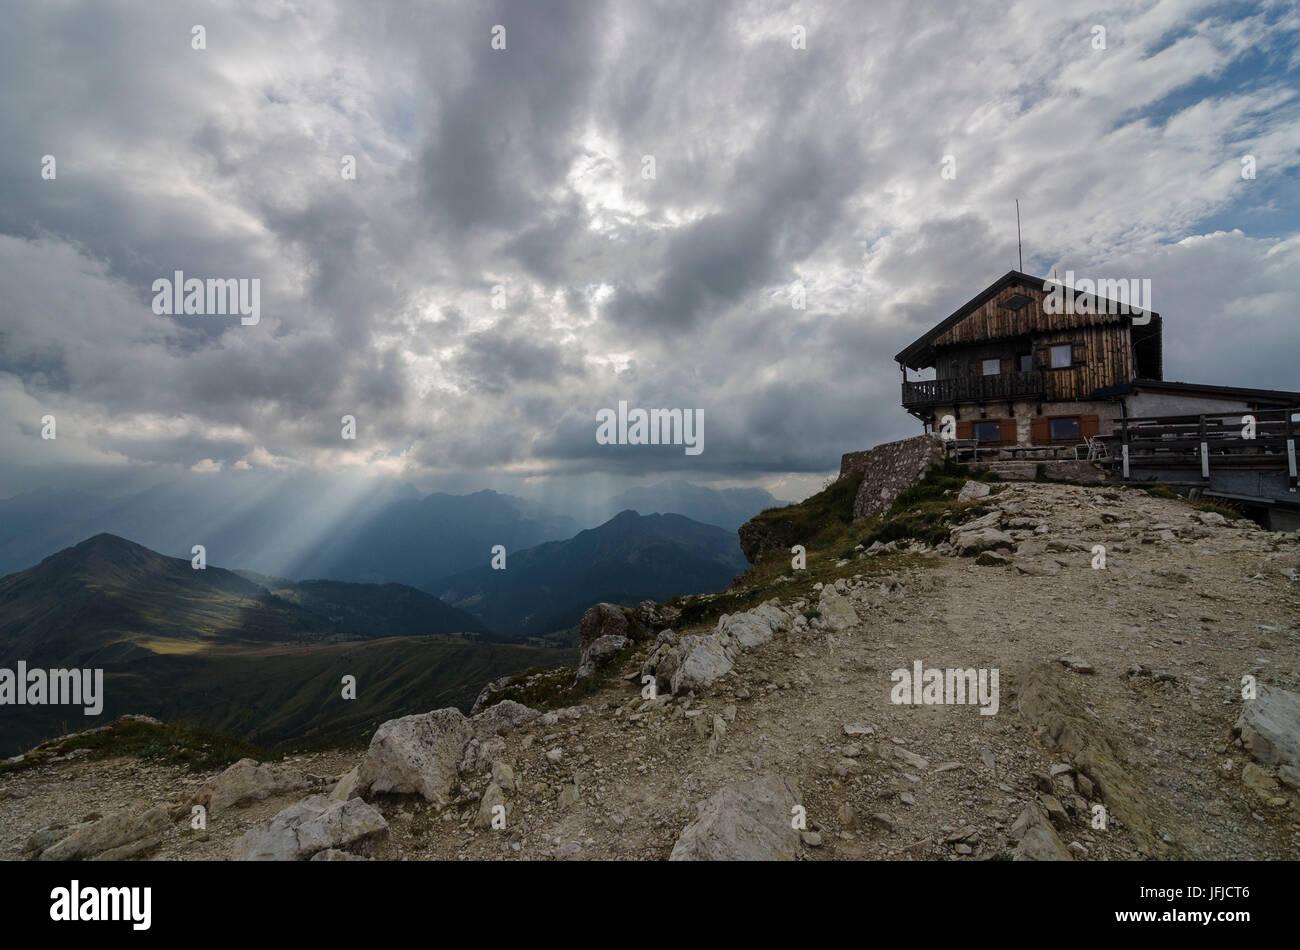 Nuvolau, Falzarego Pass, Cortina d'Ampezzo, Dolomiti, Dolomites, Veneto, Italy, Nuvolau refuge - Stock Image